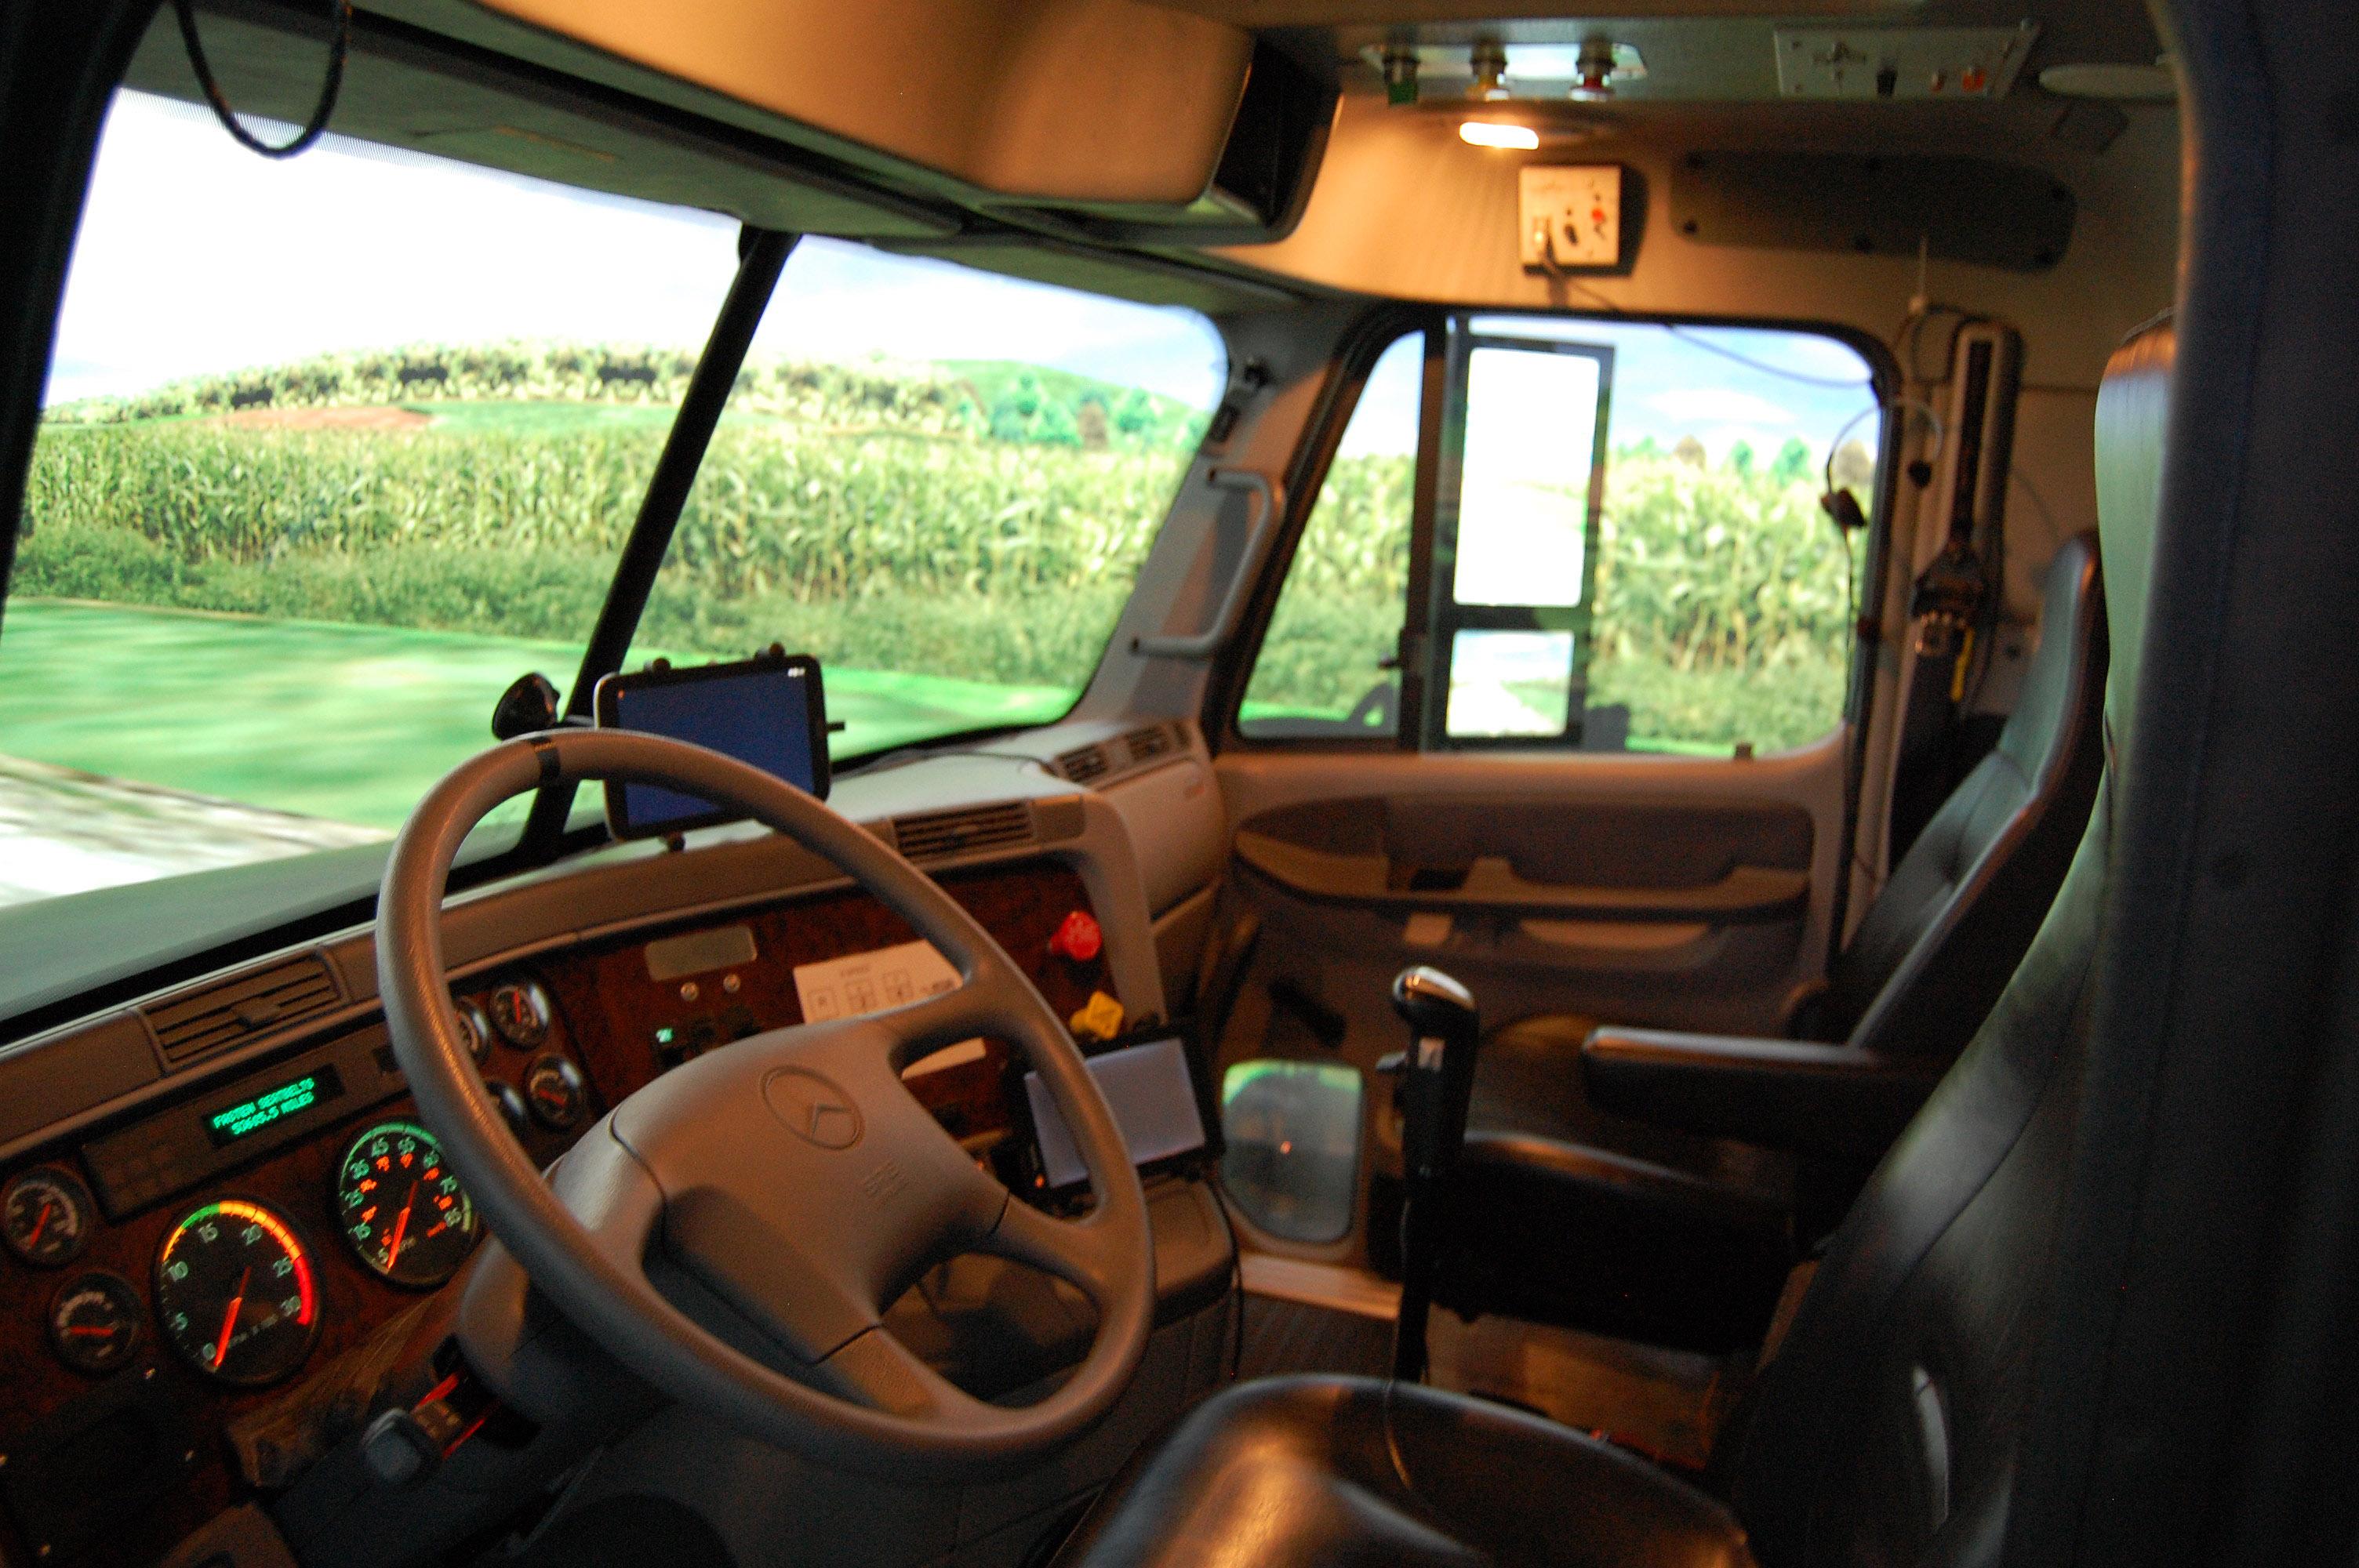 Old Driving Simulator Nads Freightliner Inside